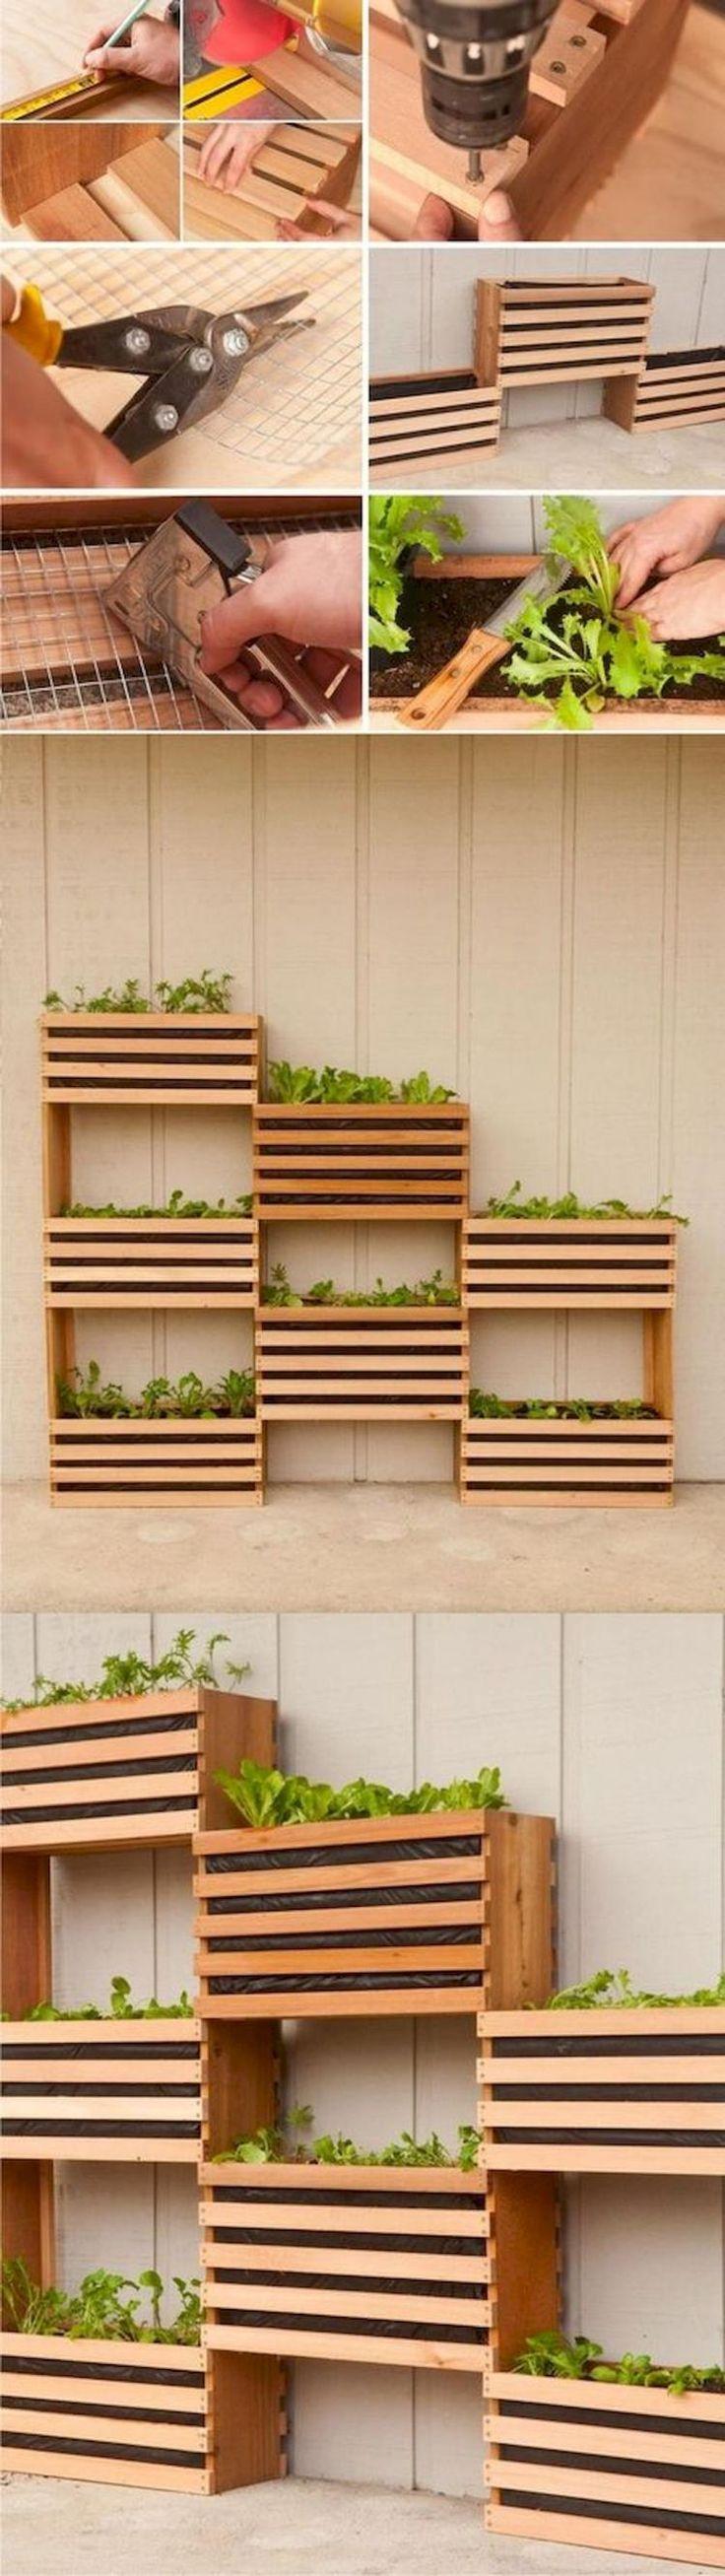 34 best 화분받침대 images on Pinterest | Vertical gardens, Gardening ...